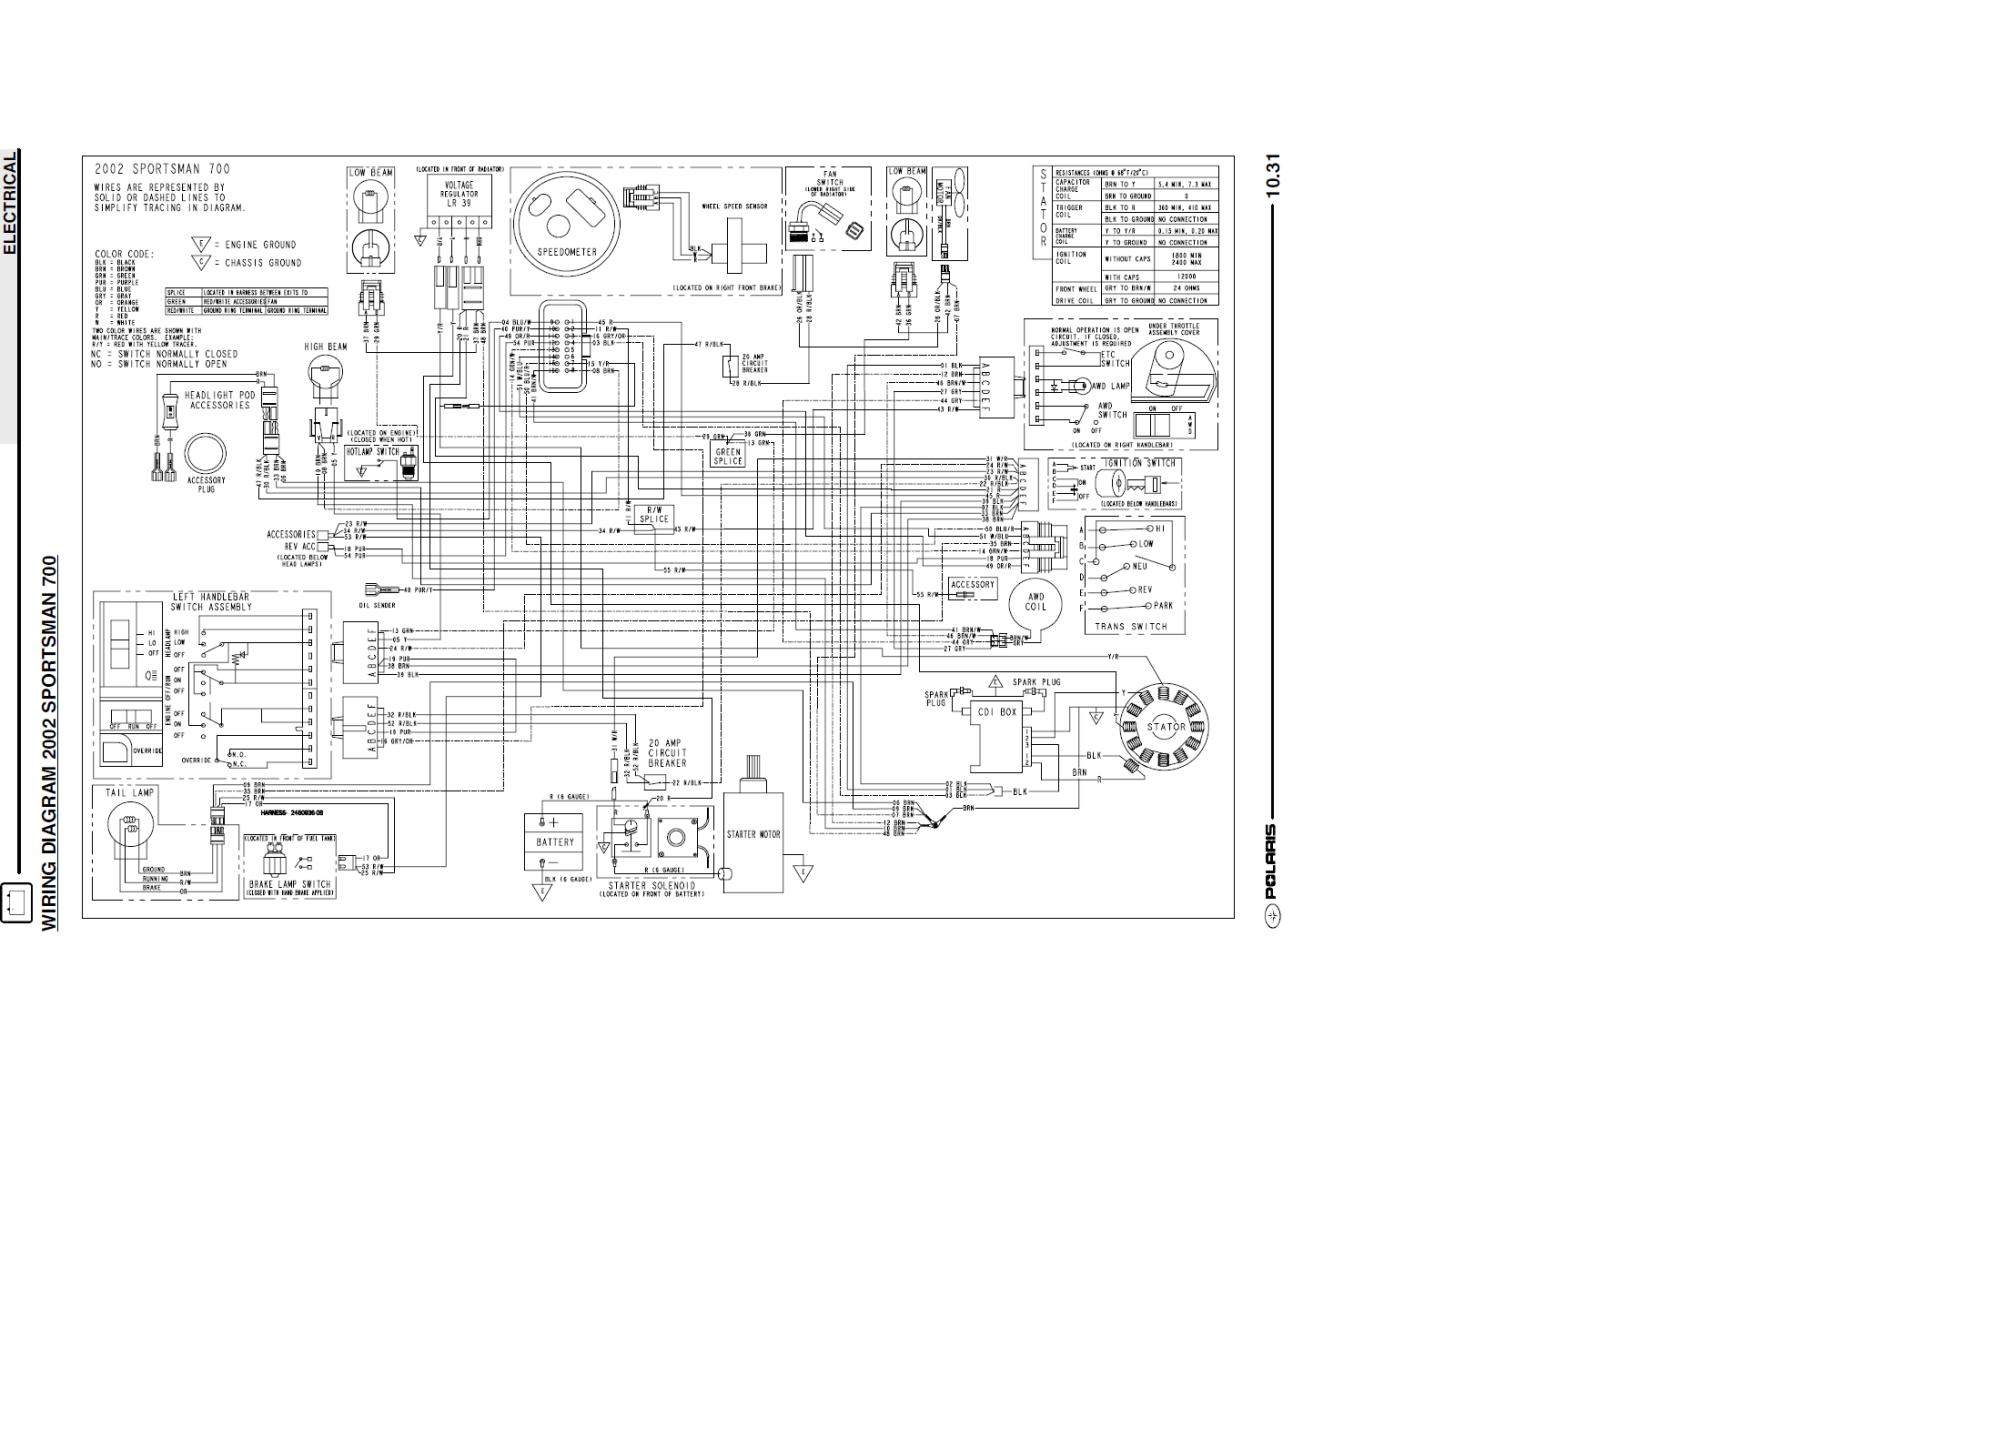 hight resolution of rzr xp 1000 wiring diagram wiring diagram yerrzr 1000 wiring diagram wiring diagram schema 2015 polaris